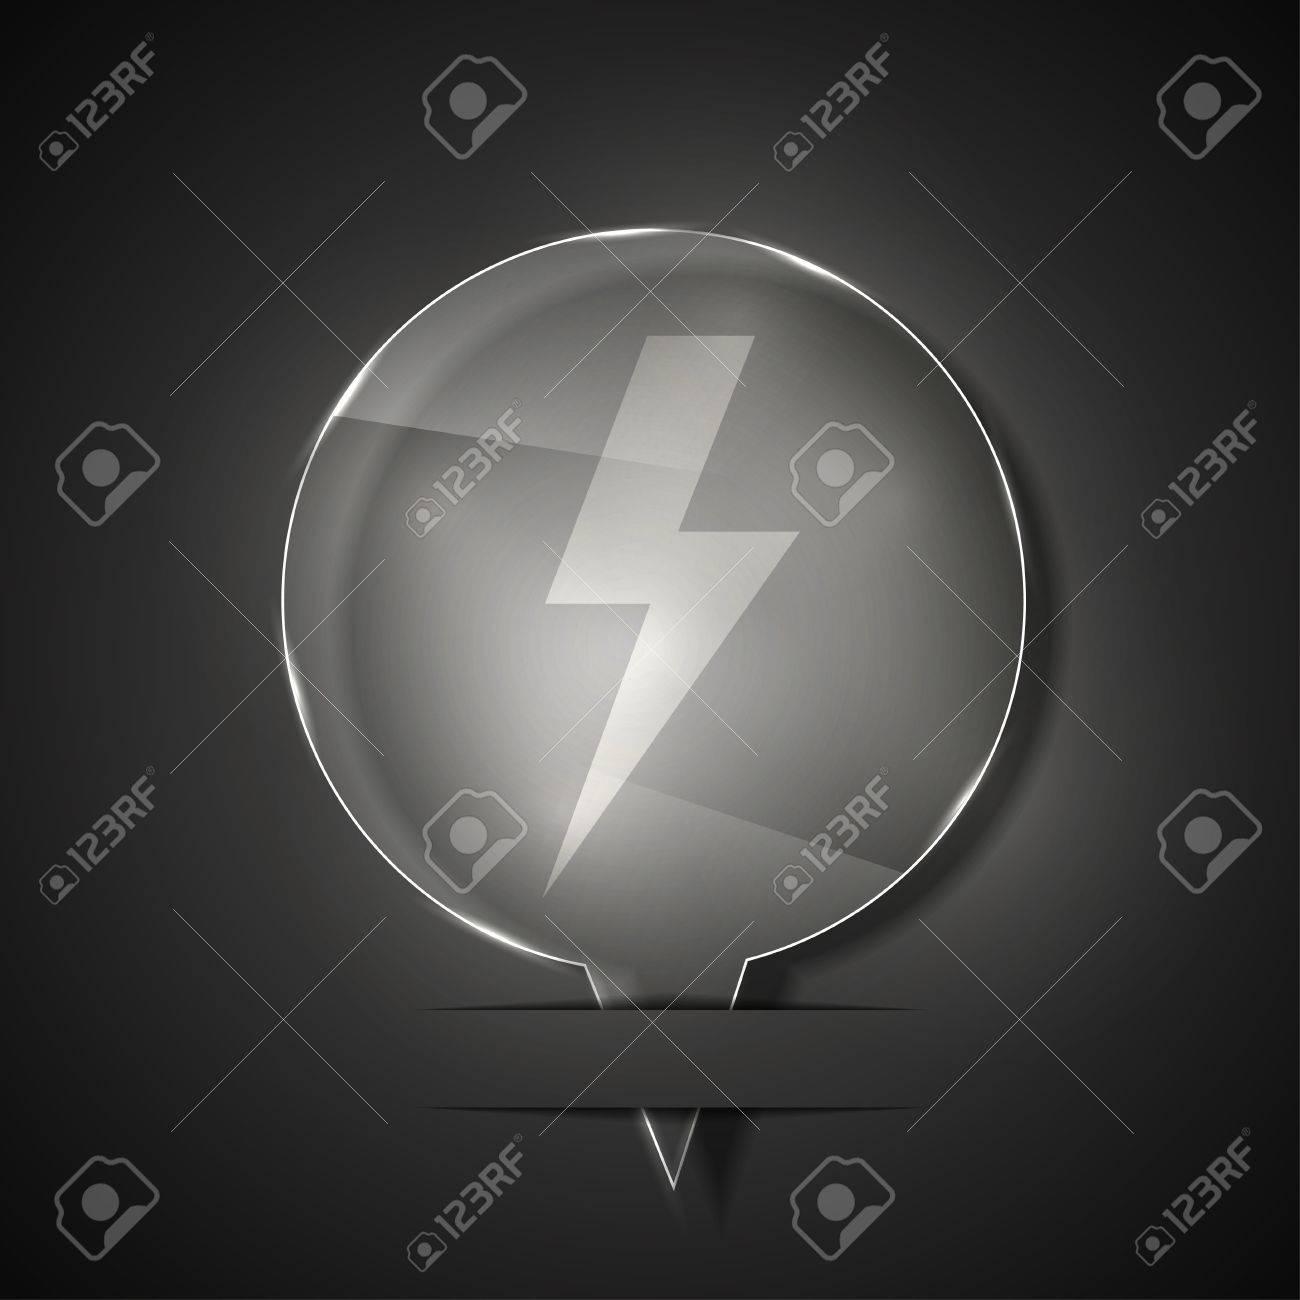 glass lightning bolt icon on gray background. Stock Vector - 15145556